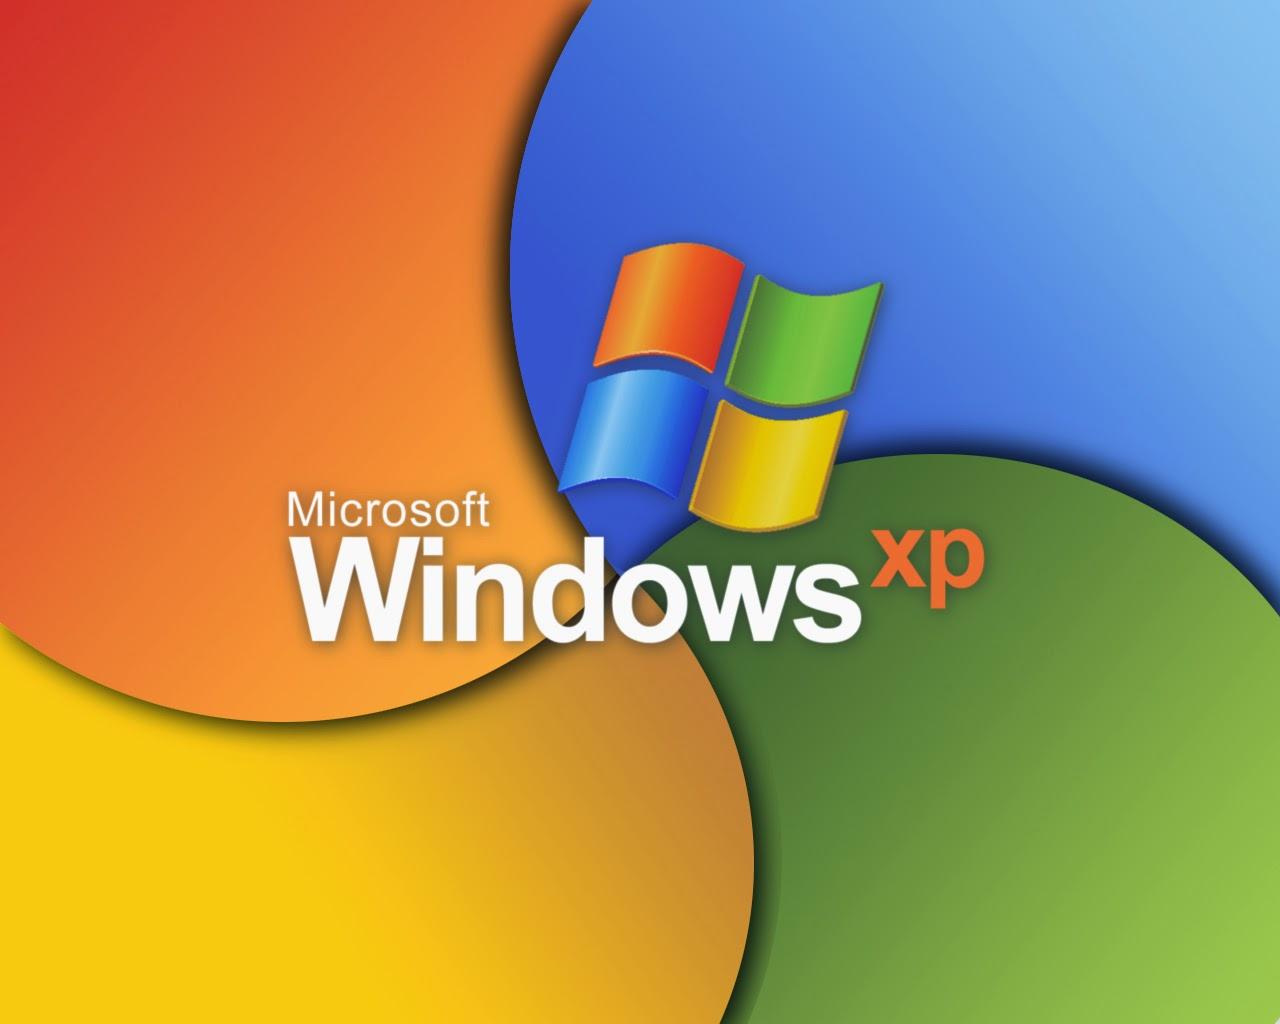 windows xp, xp, microsoft, vip